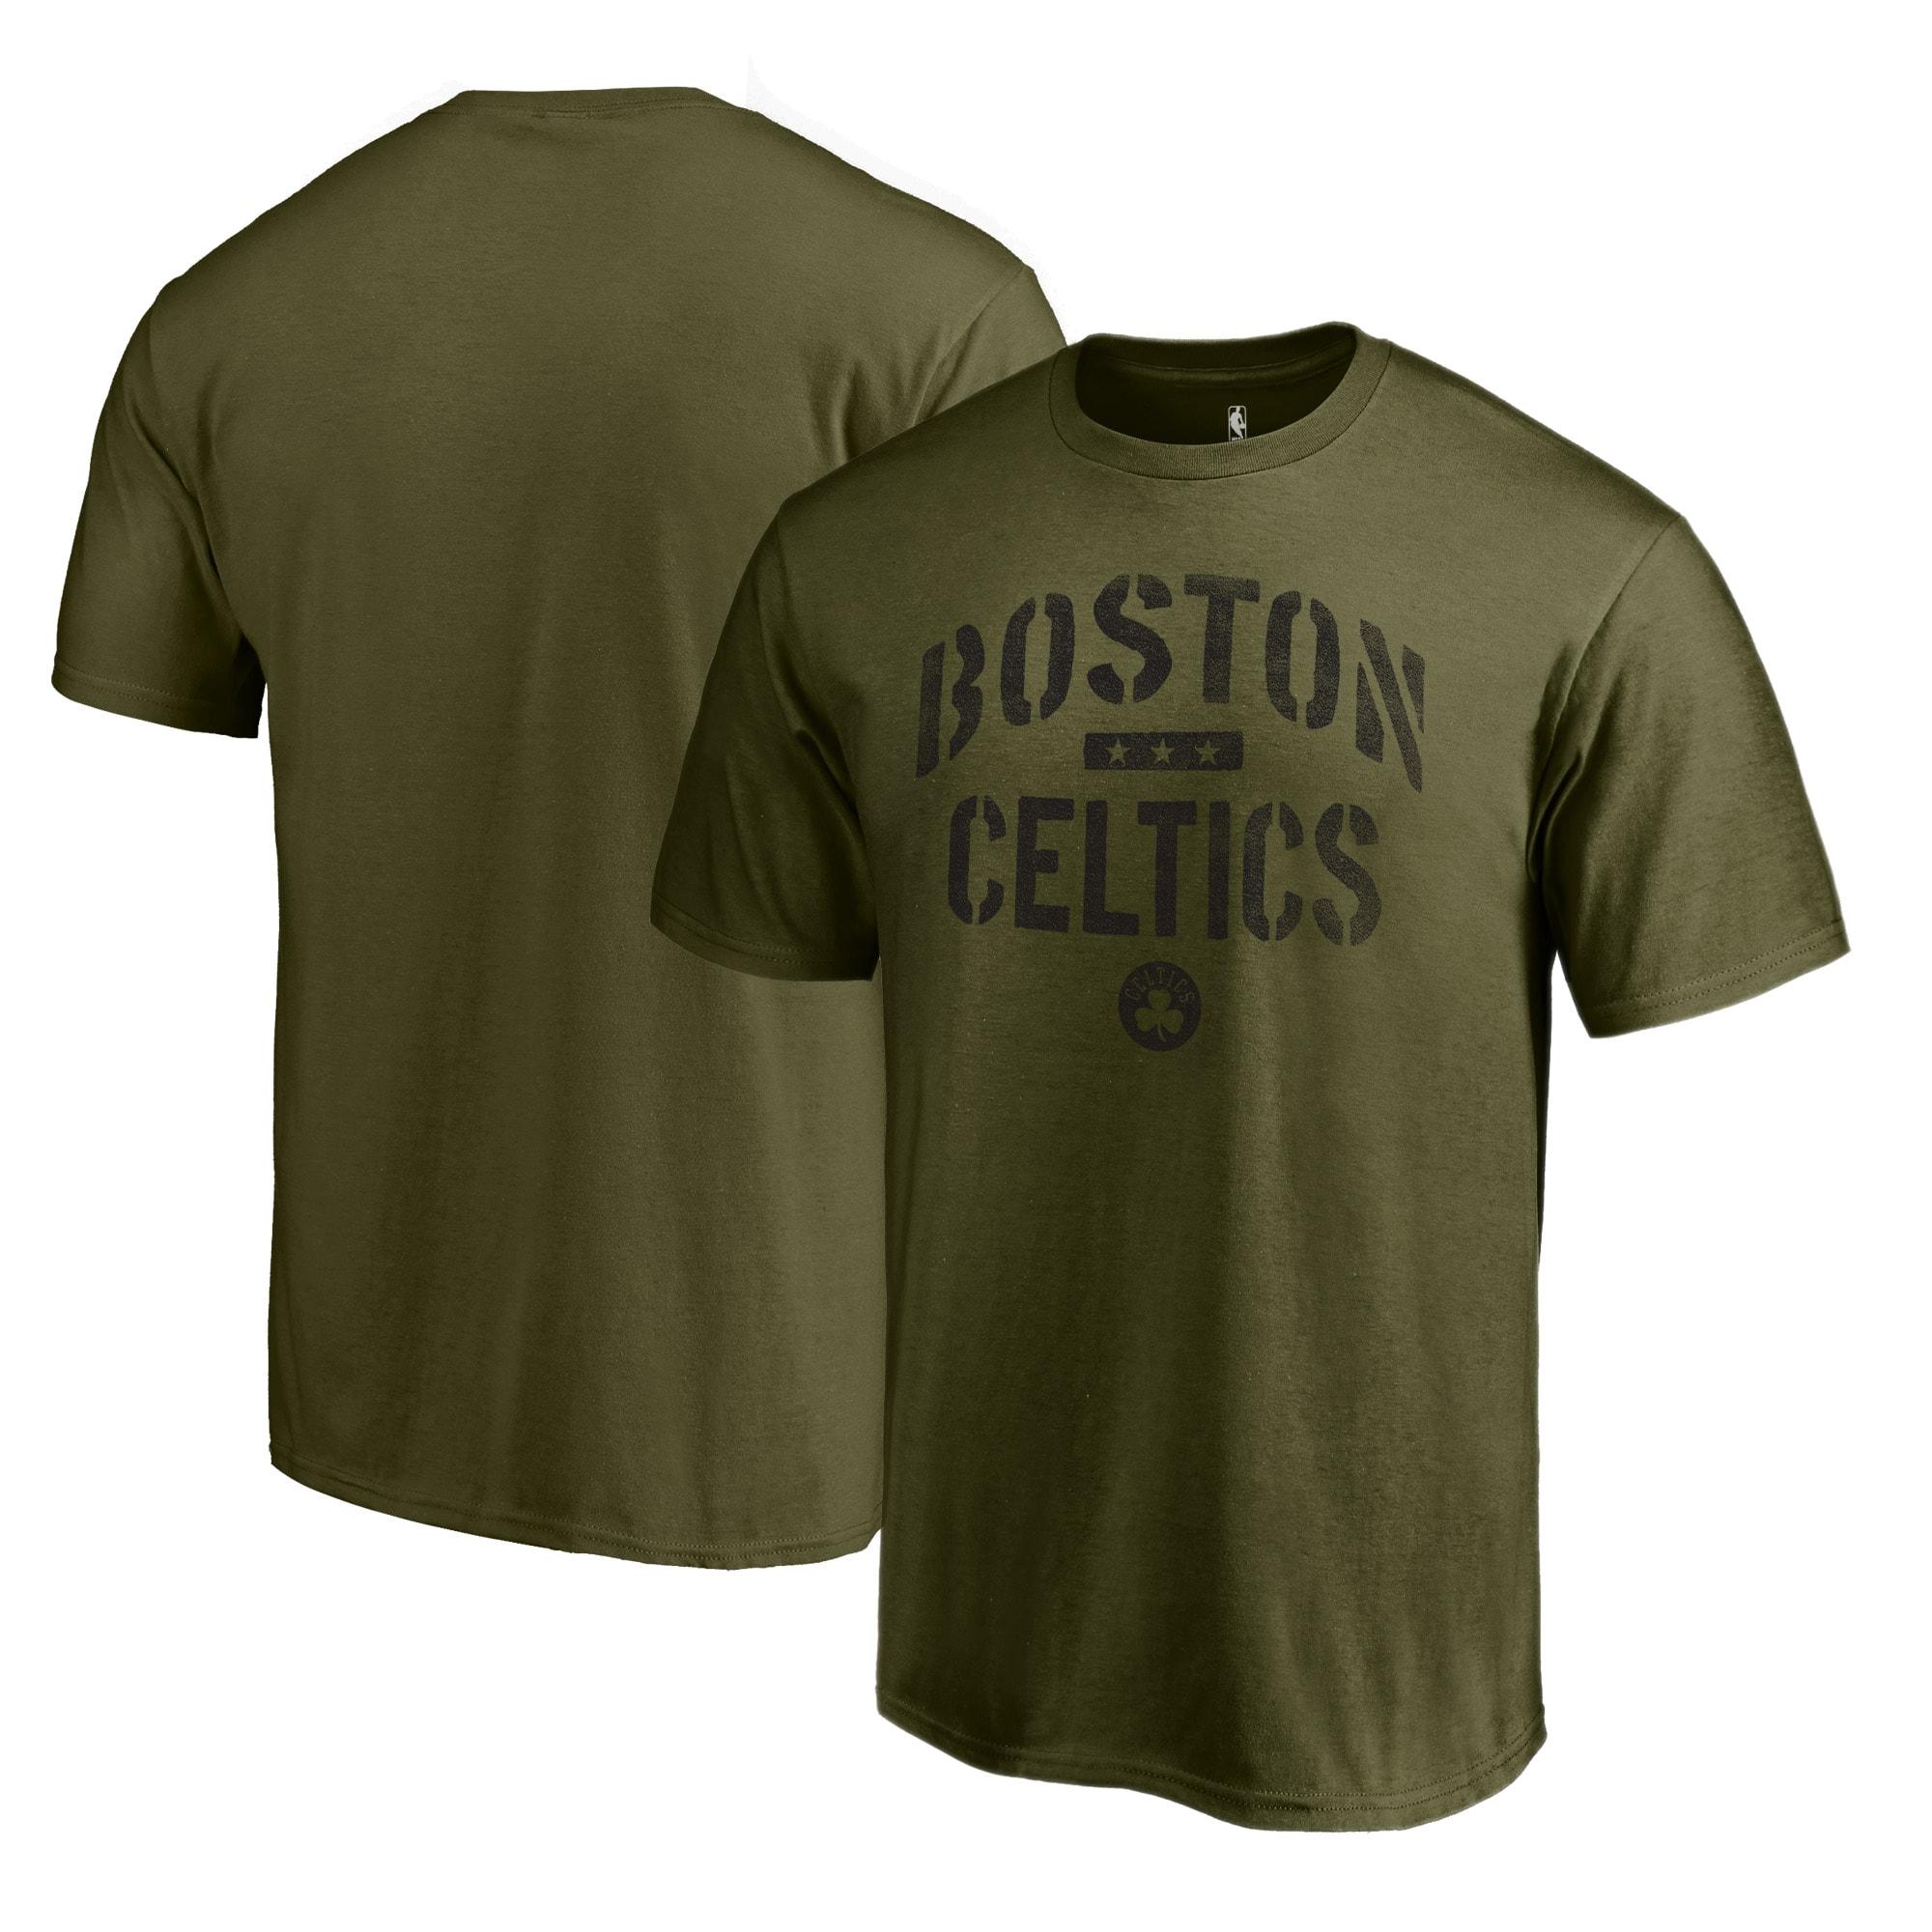 Boston Celtics Fanatics Branded Camo Collection Jungle T-Shirt - Green